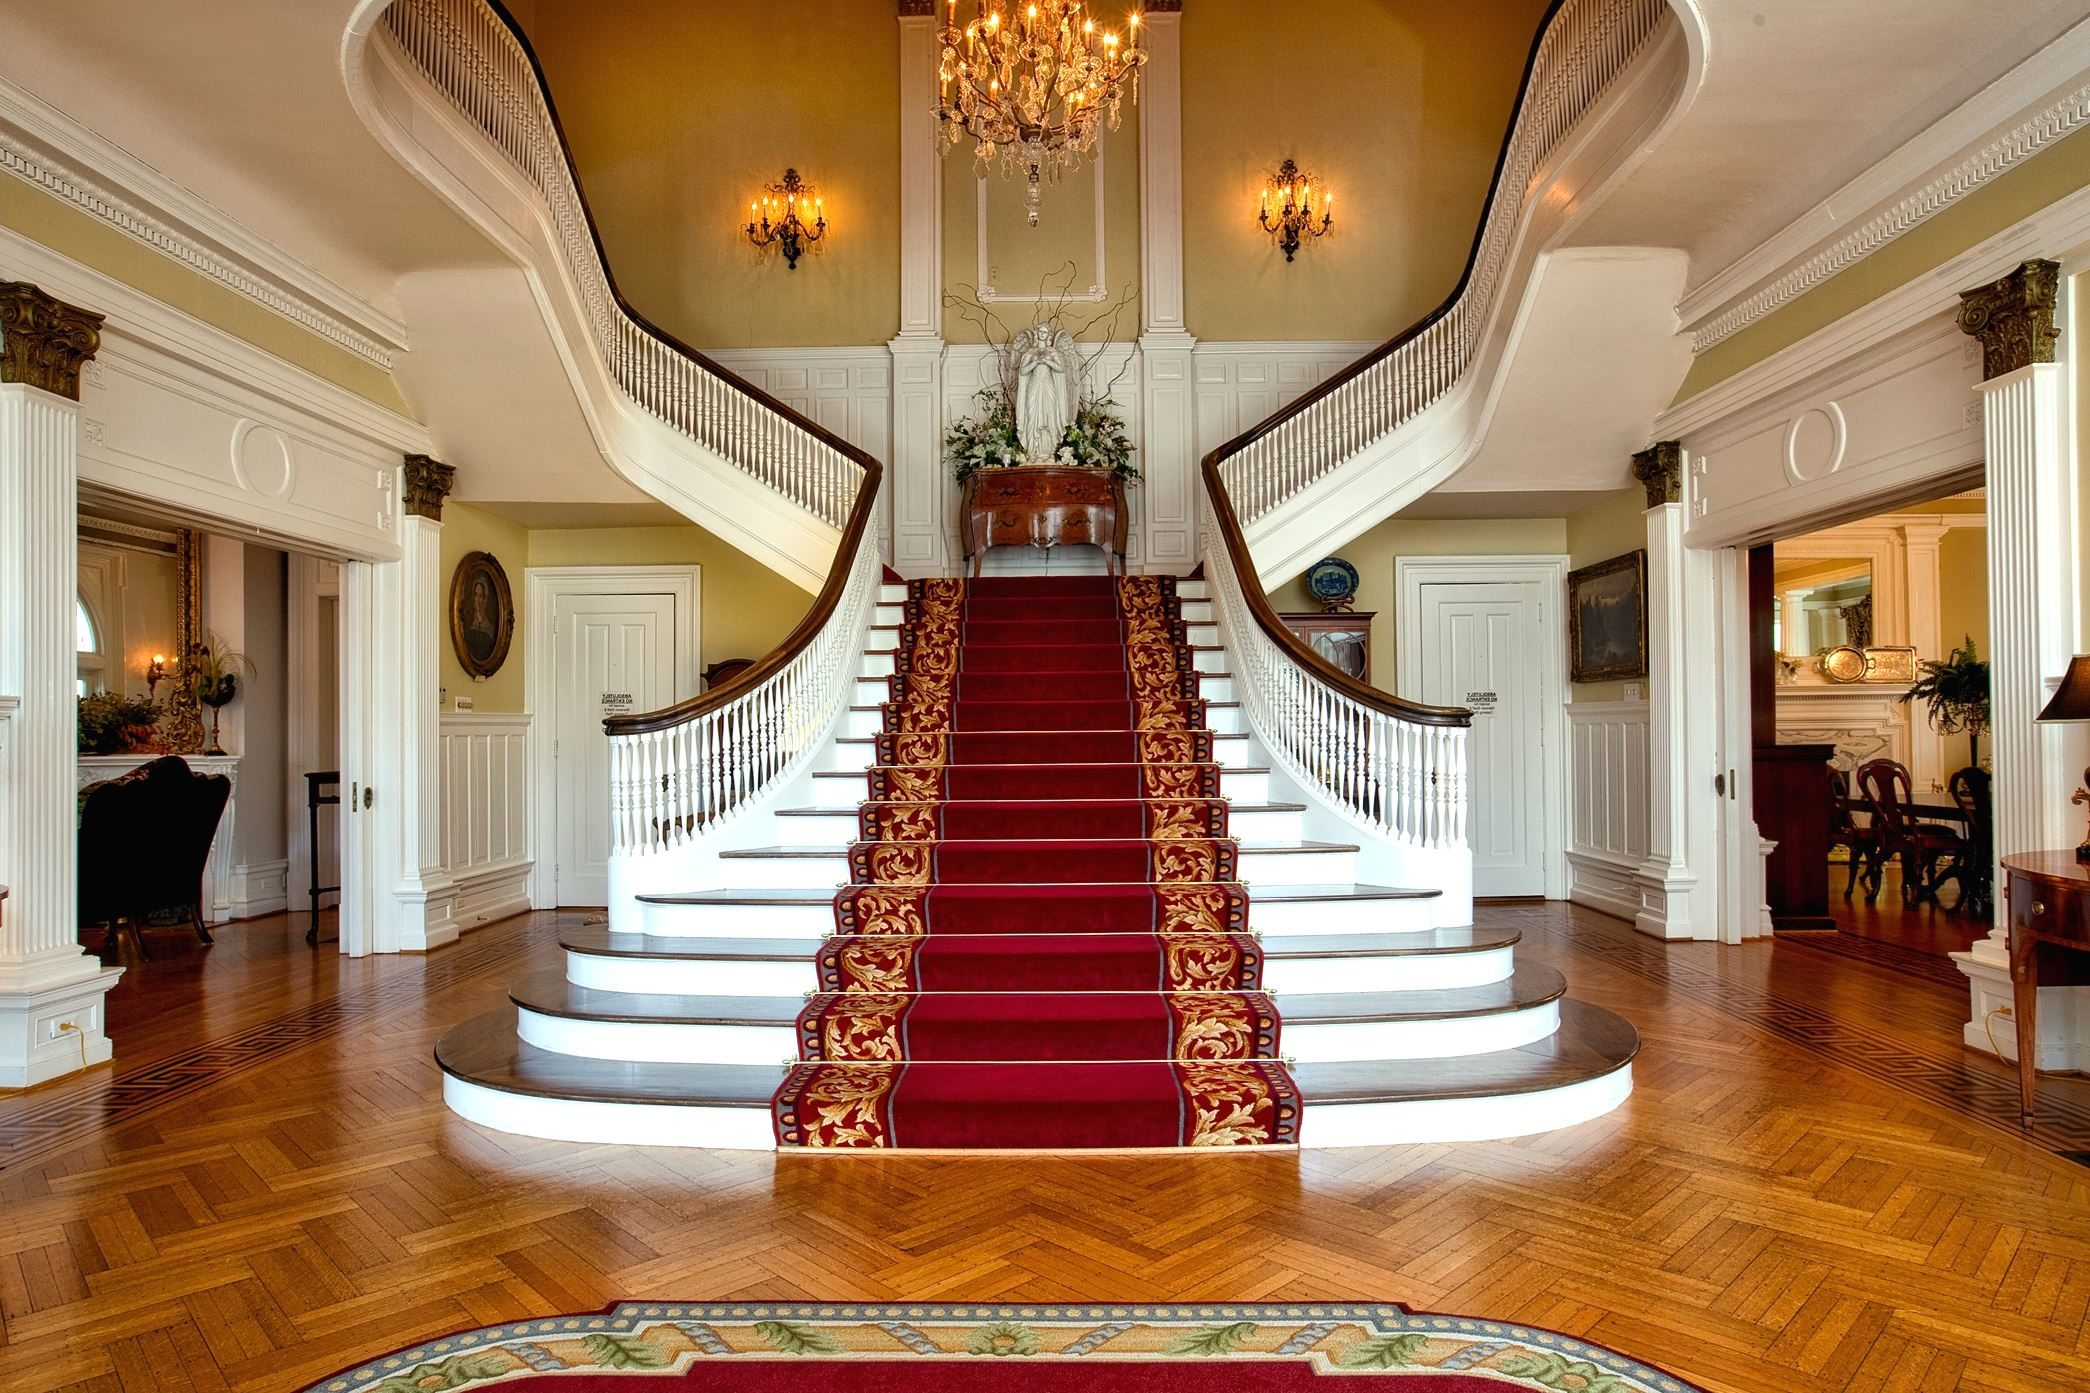 Free picture design stairs architecture chandelier elegant furniture